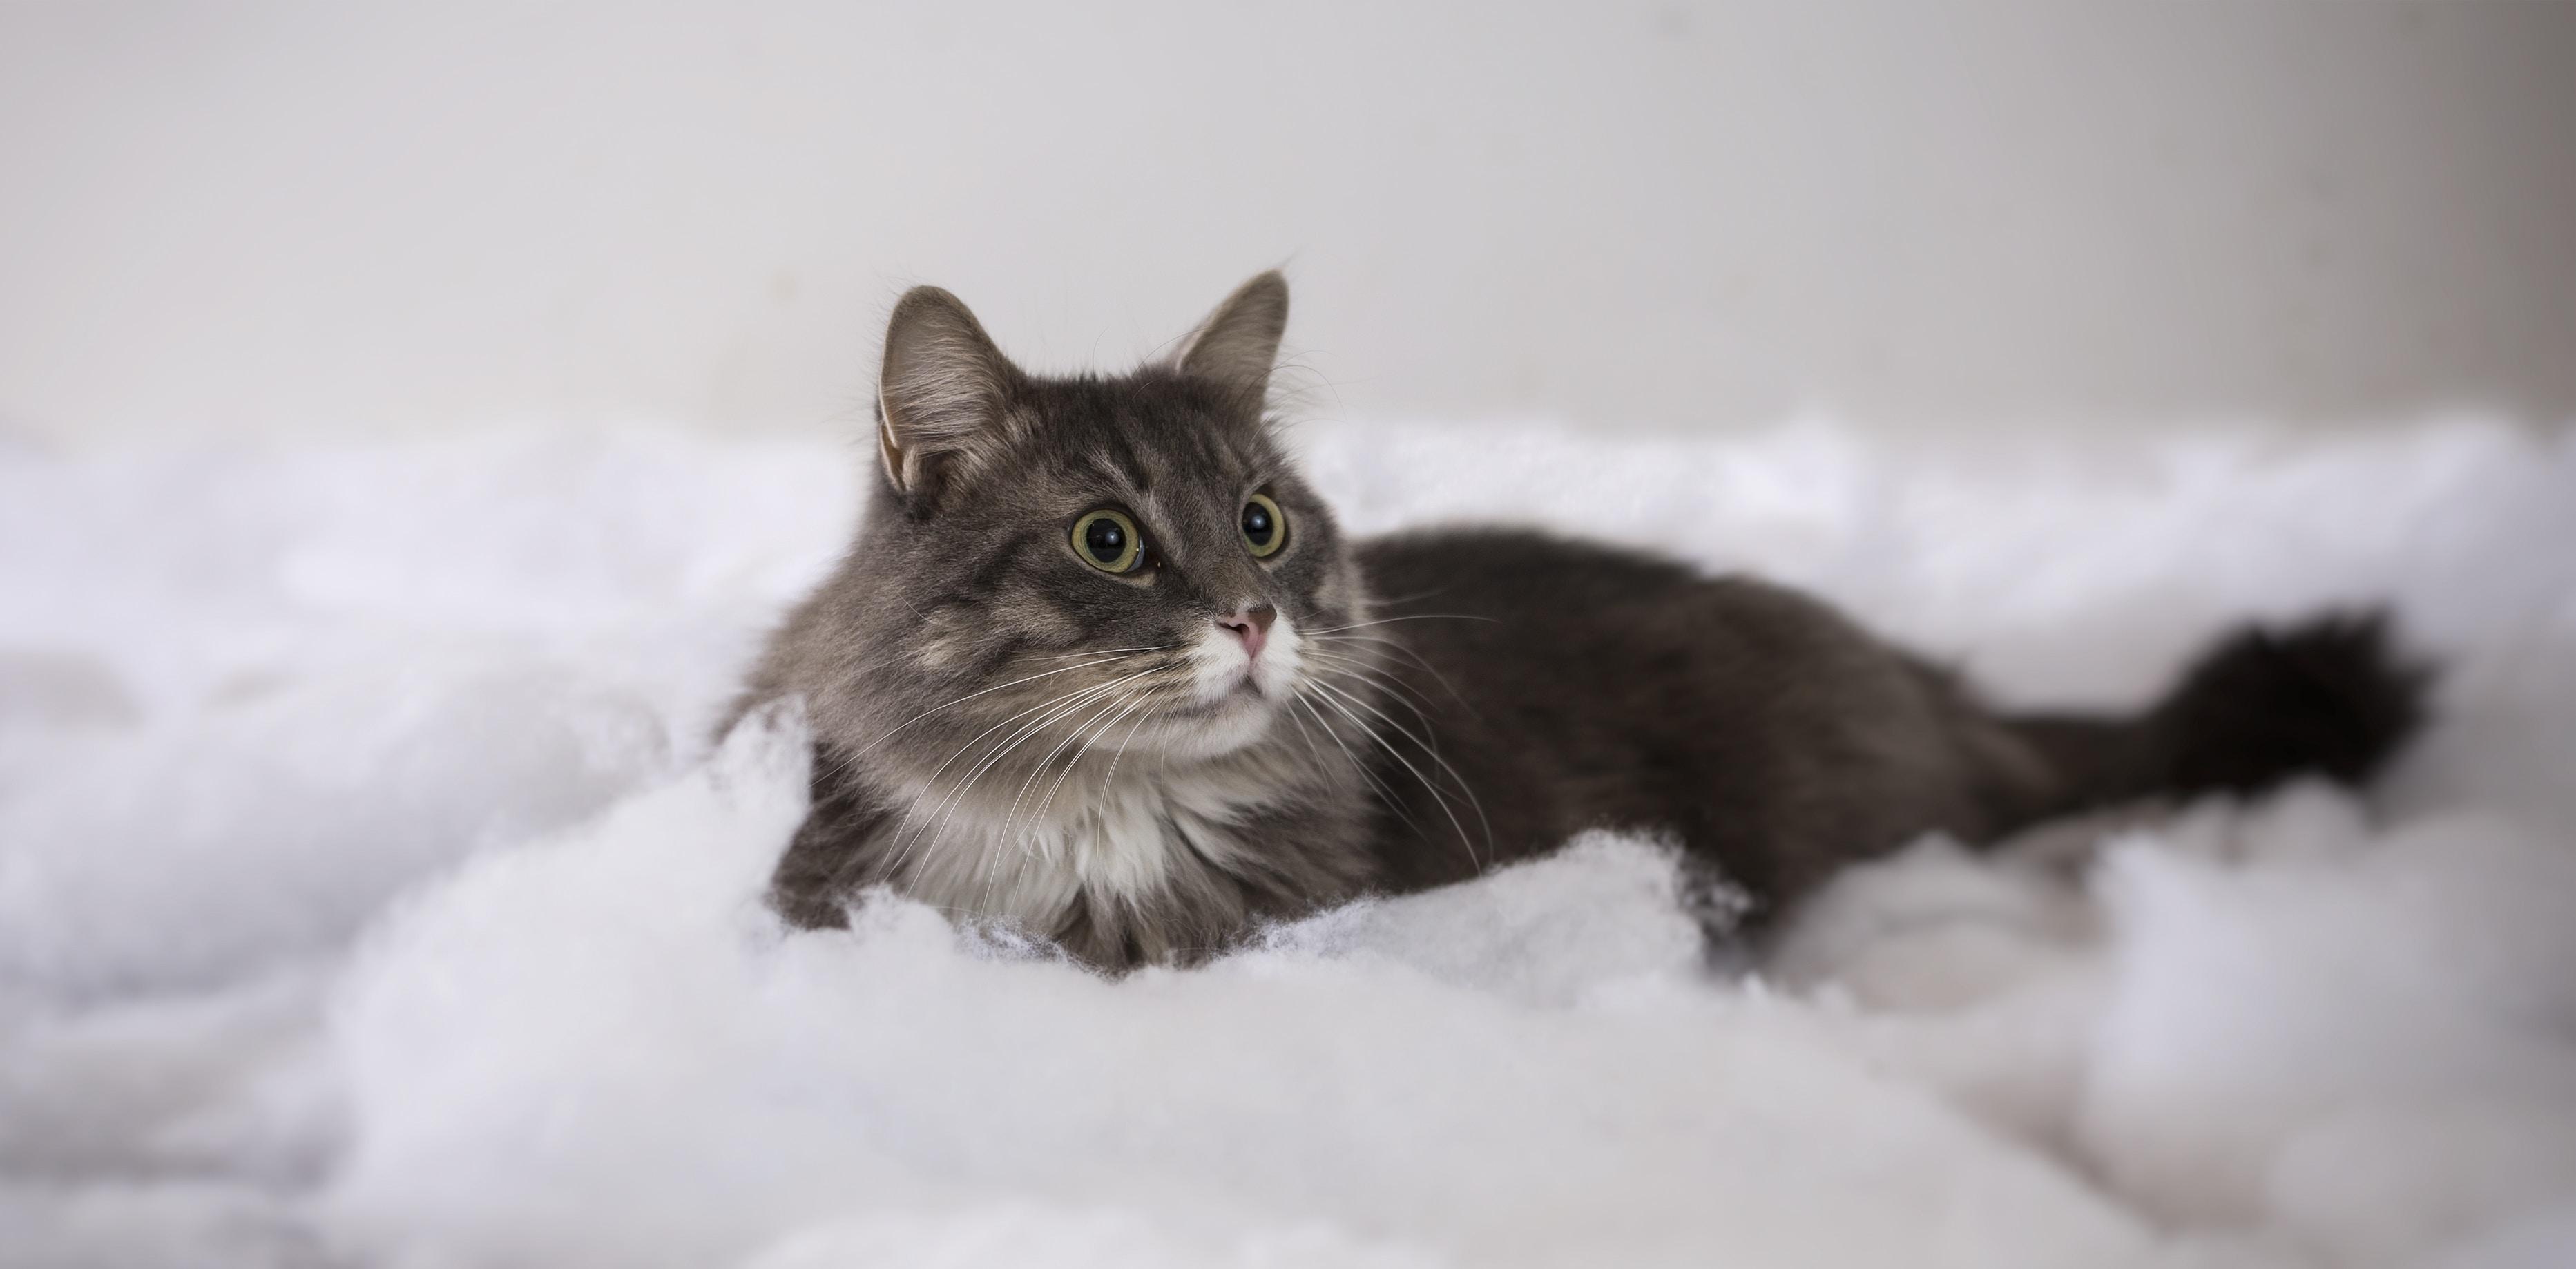 photo of short-haired black cat on foam